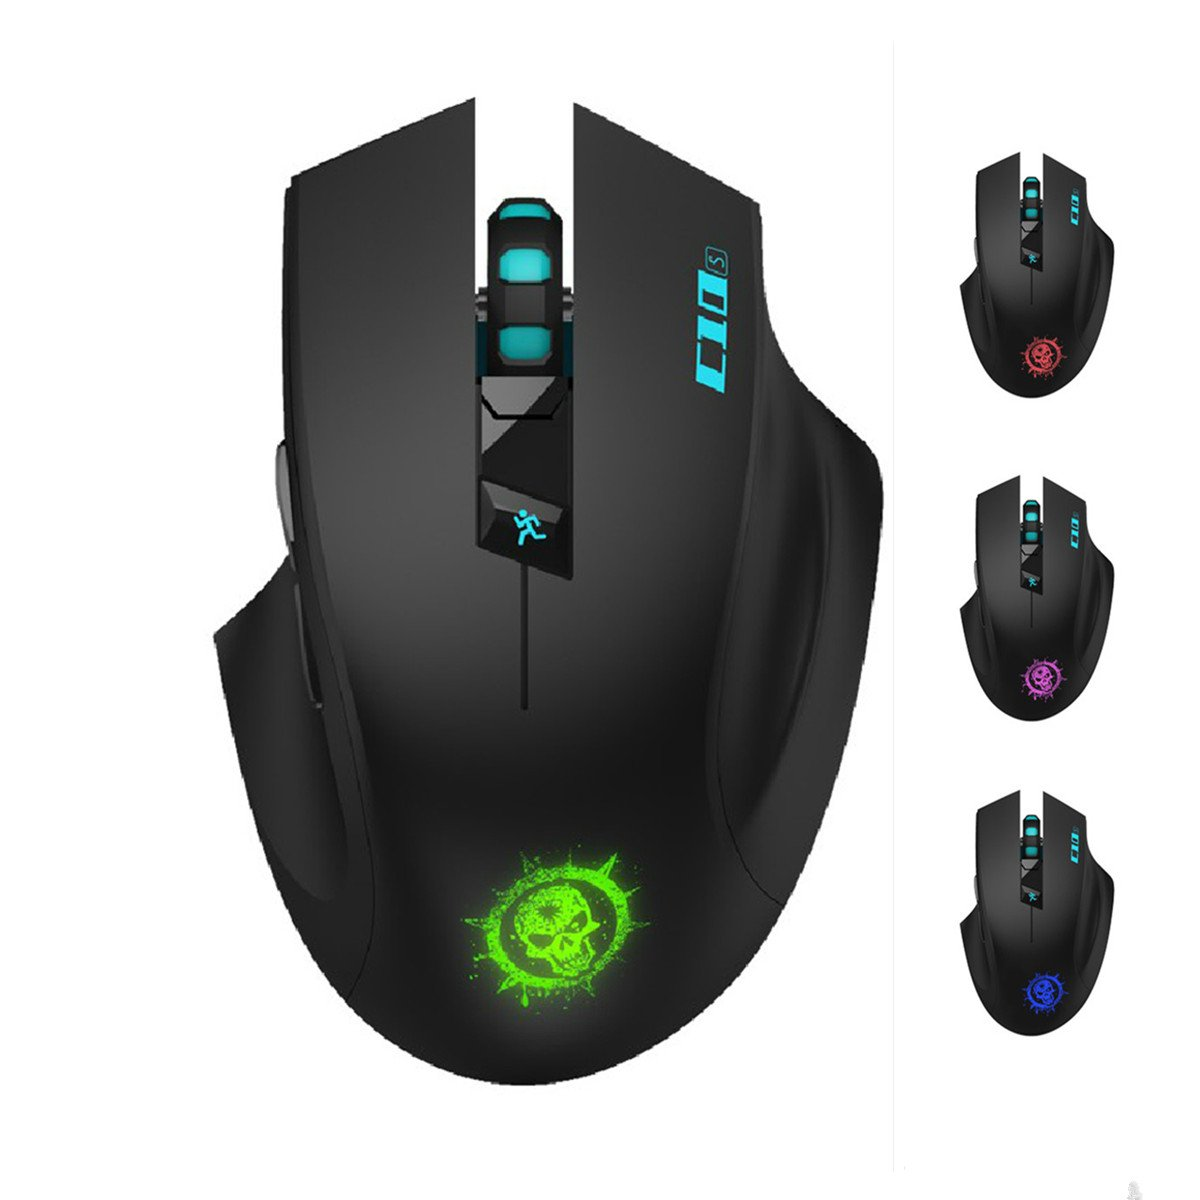 mouse gaming SROCKER C10s 2.4GHz